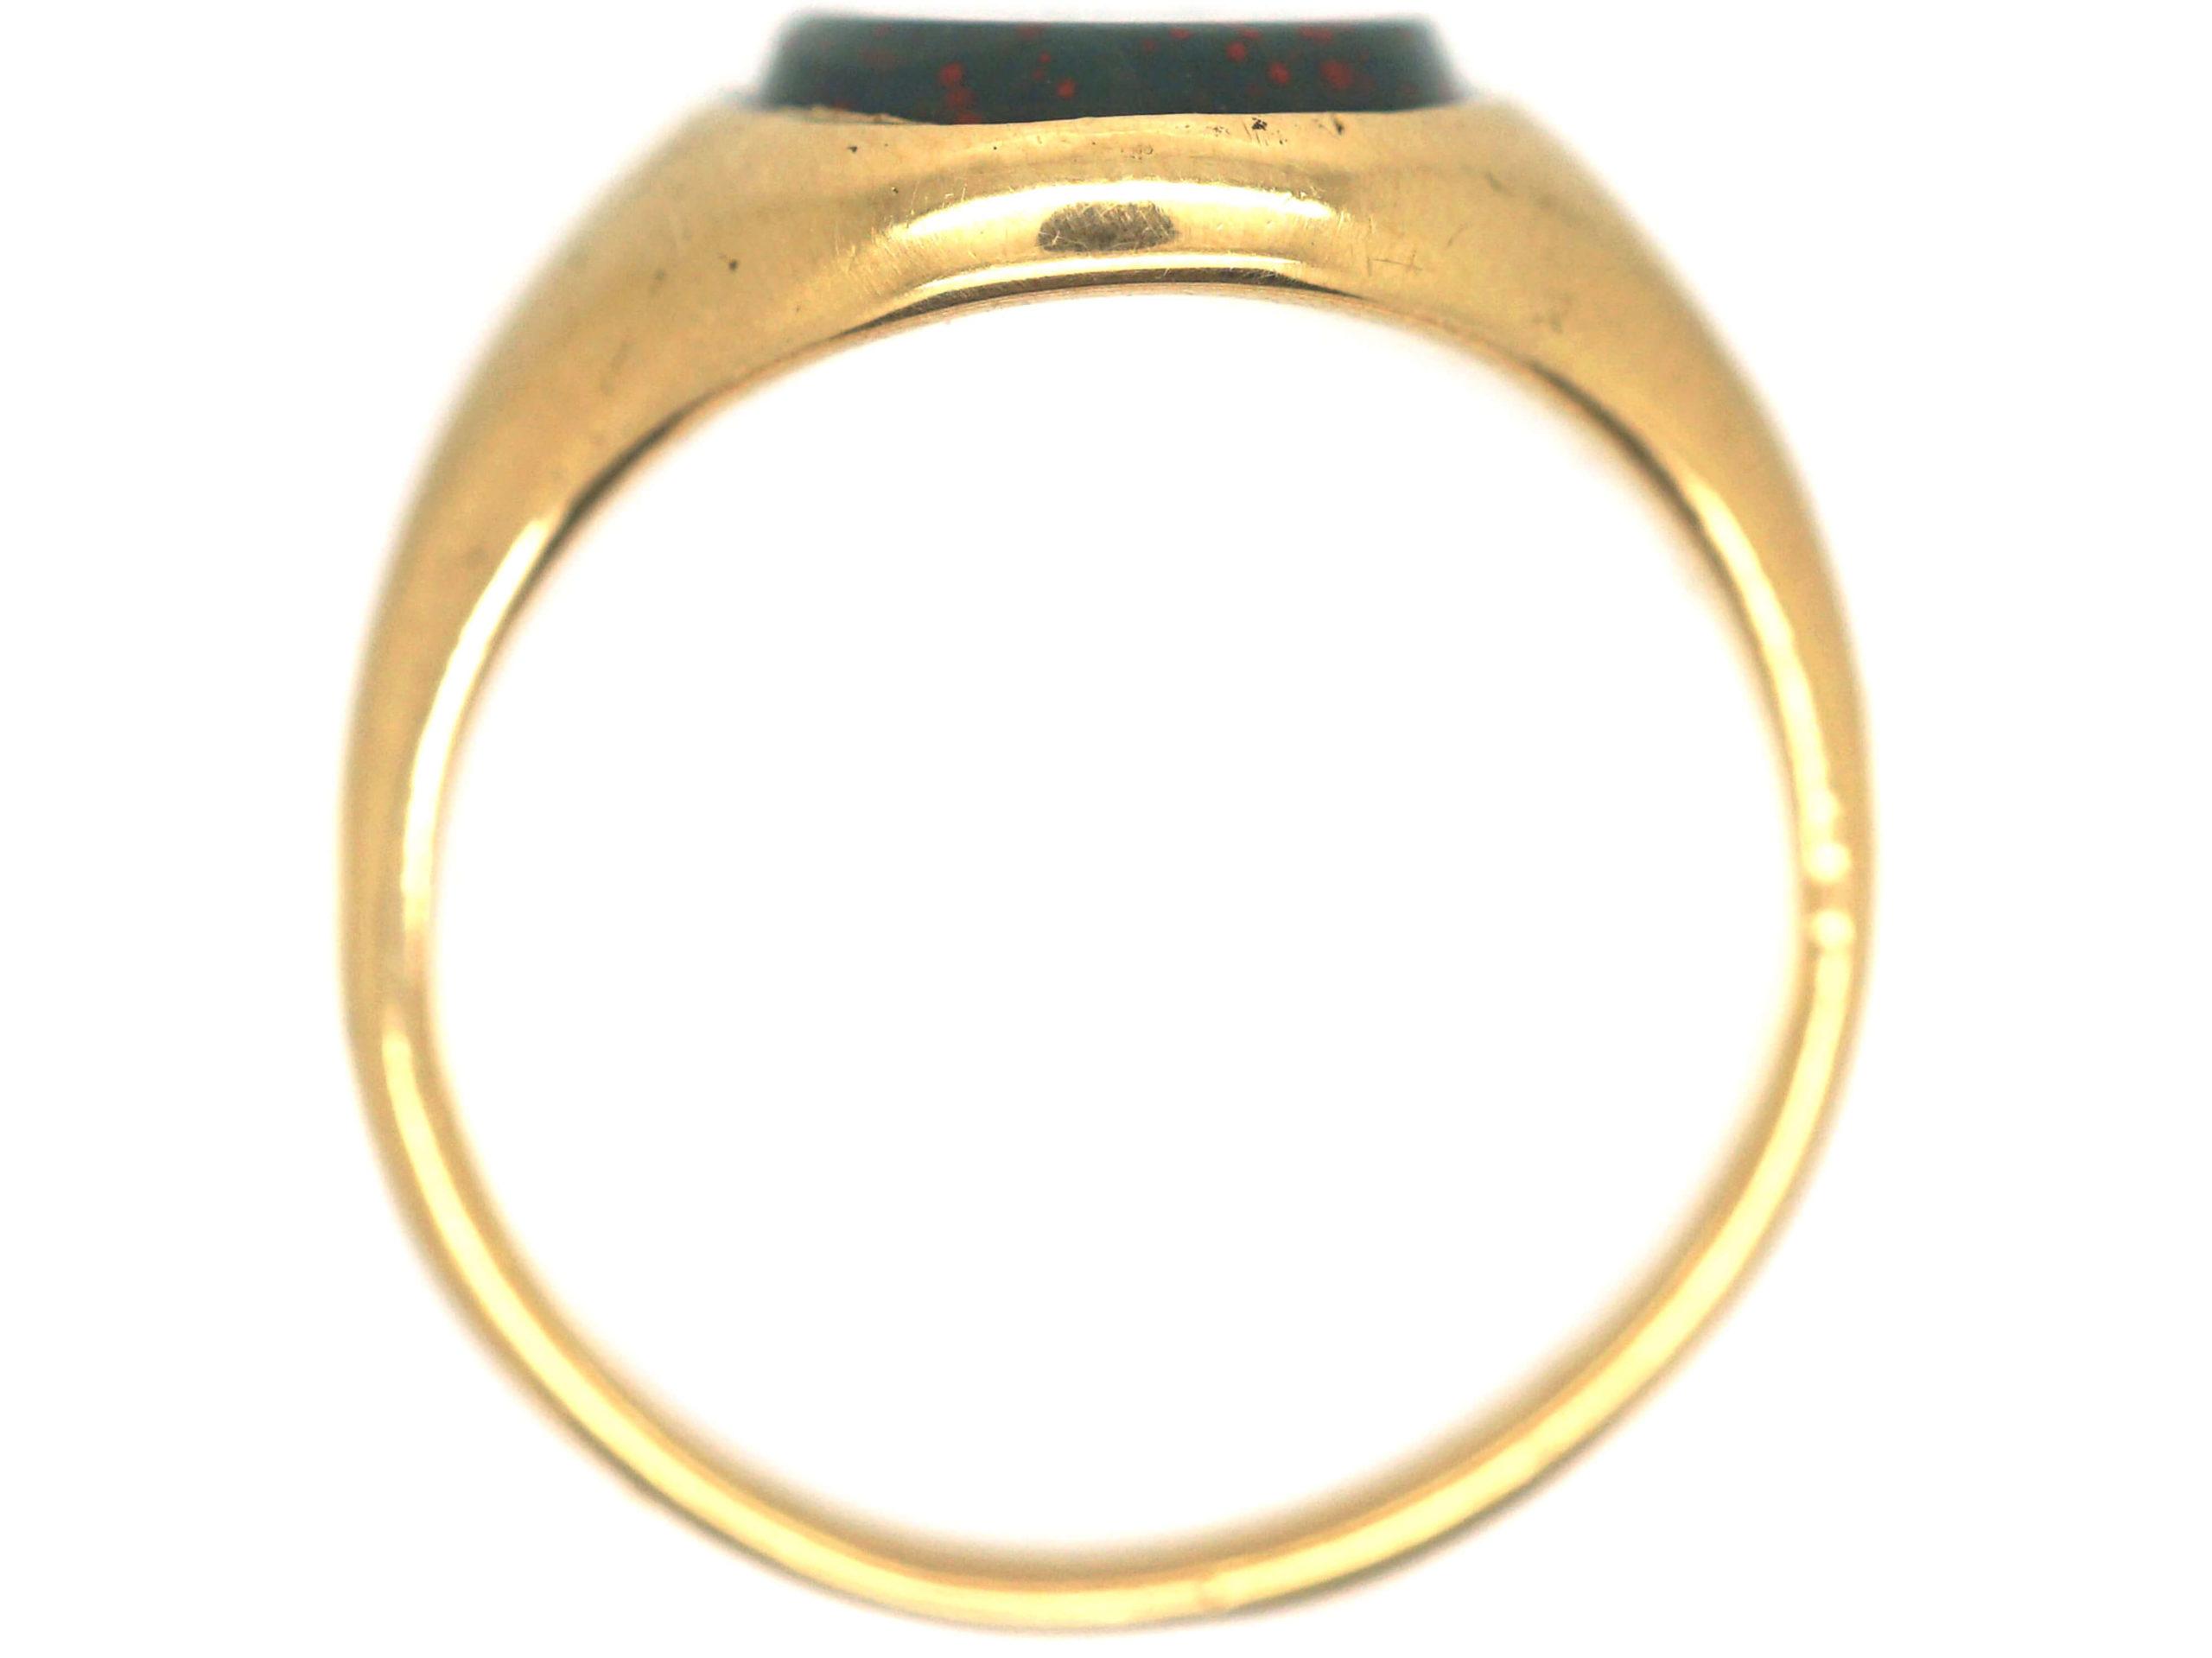 18ct Gold & Bloodstone Plain Signet Ring